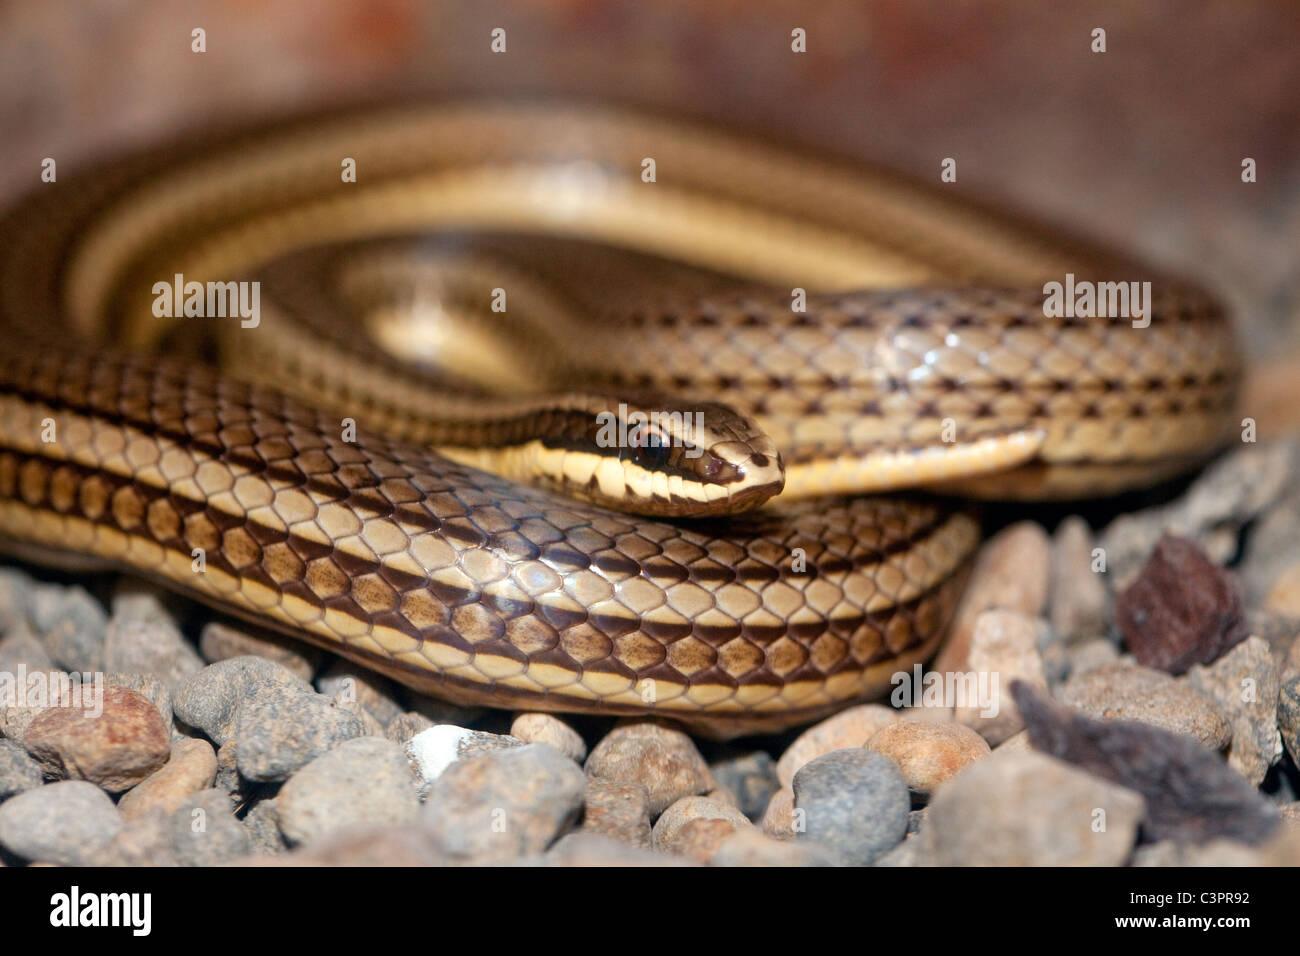 Camino común guarder (Conophis lineatus) enrollado en Costa Rica. Imagen De Stock